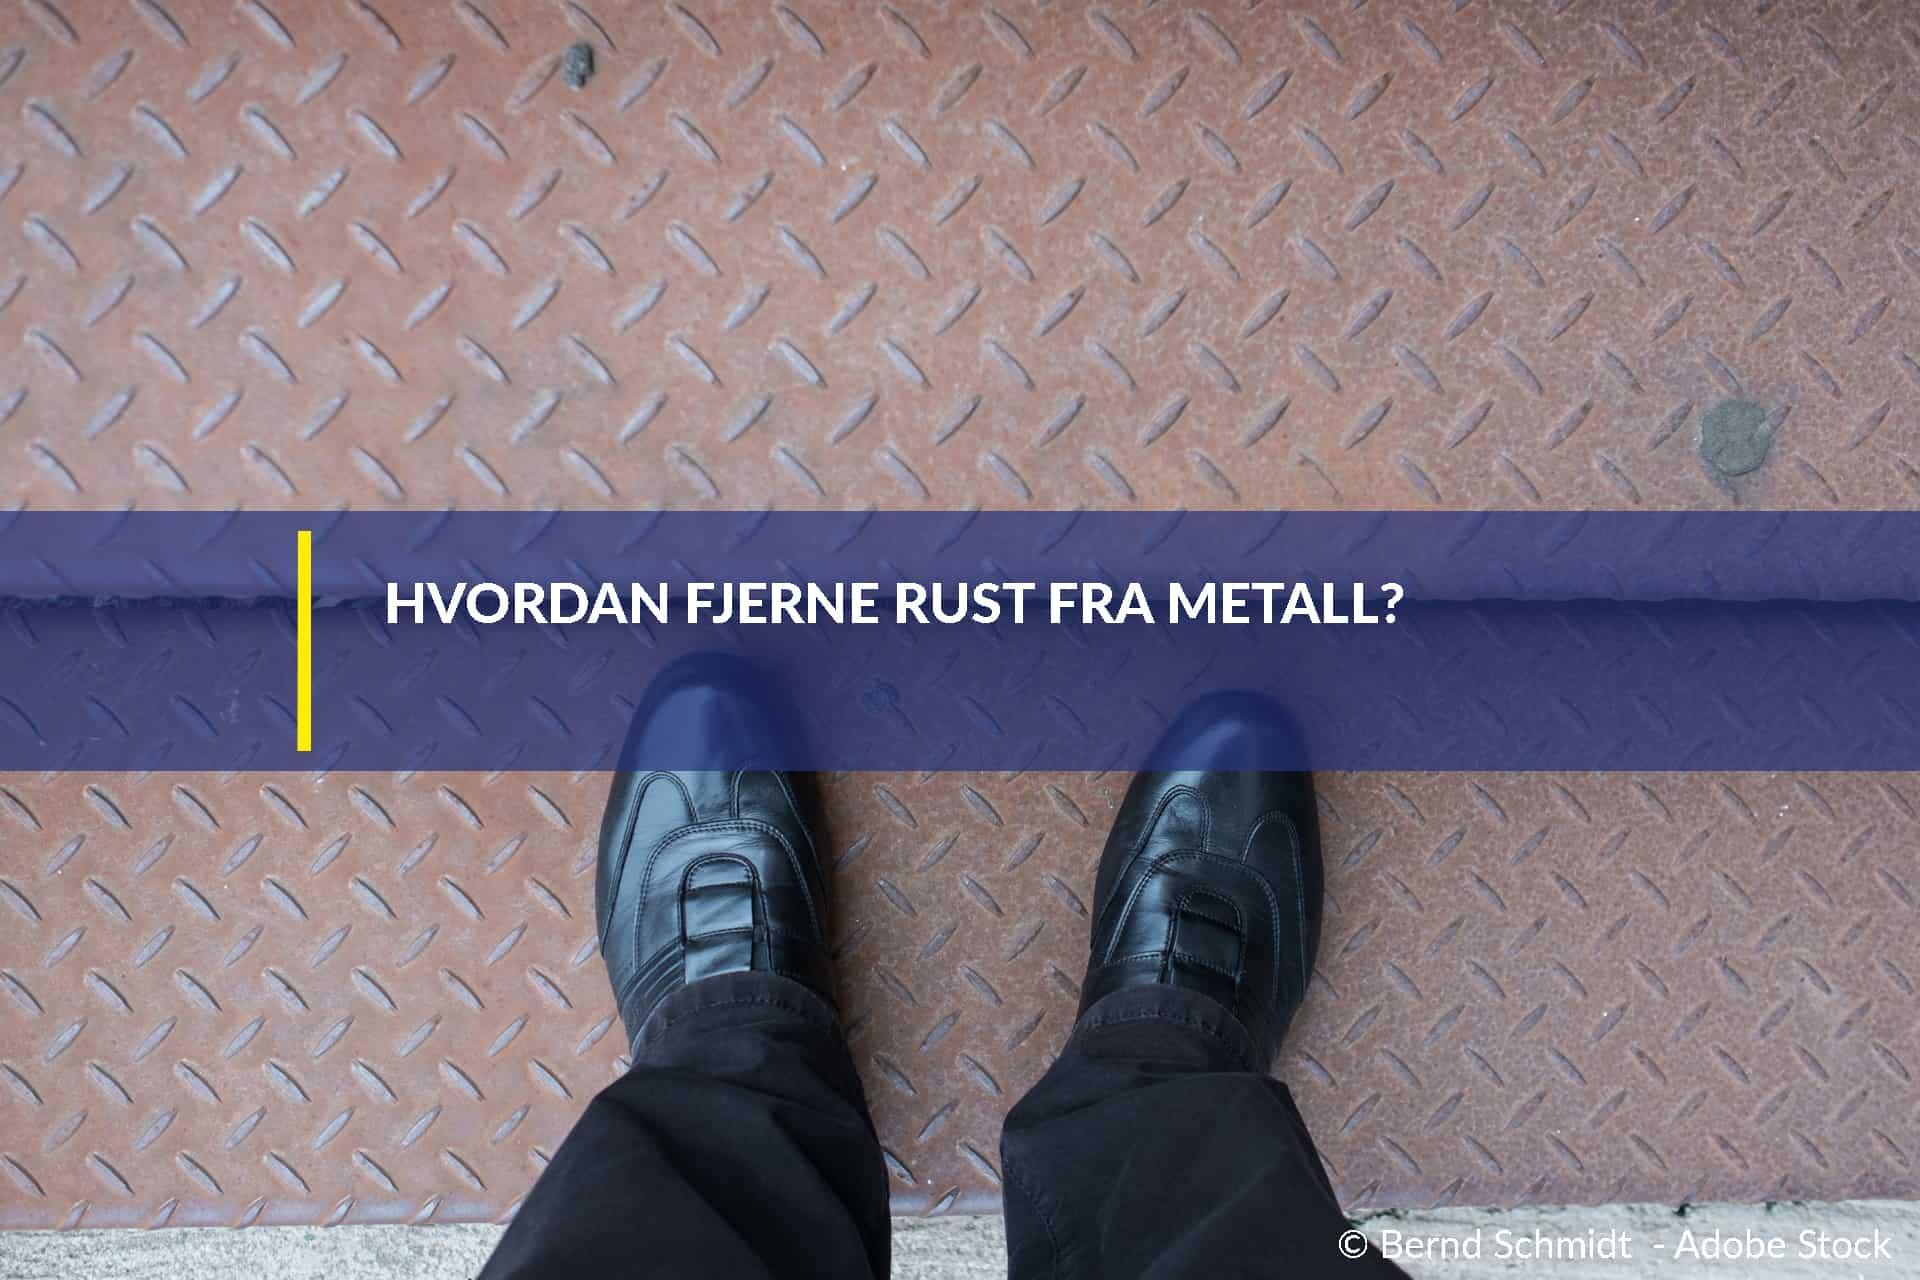 Hvordan fjerne rust fra metall